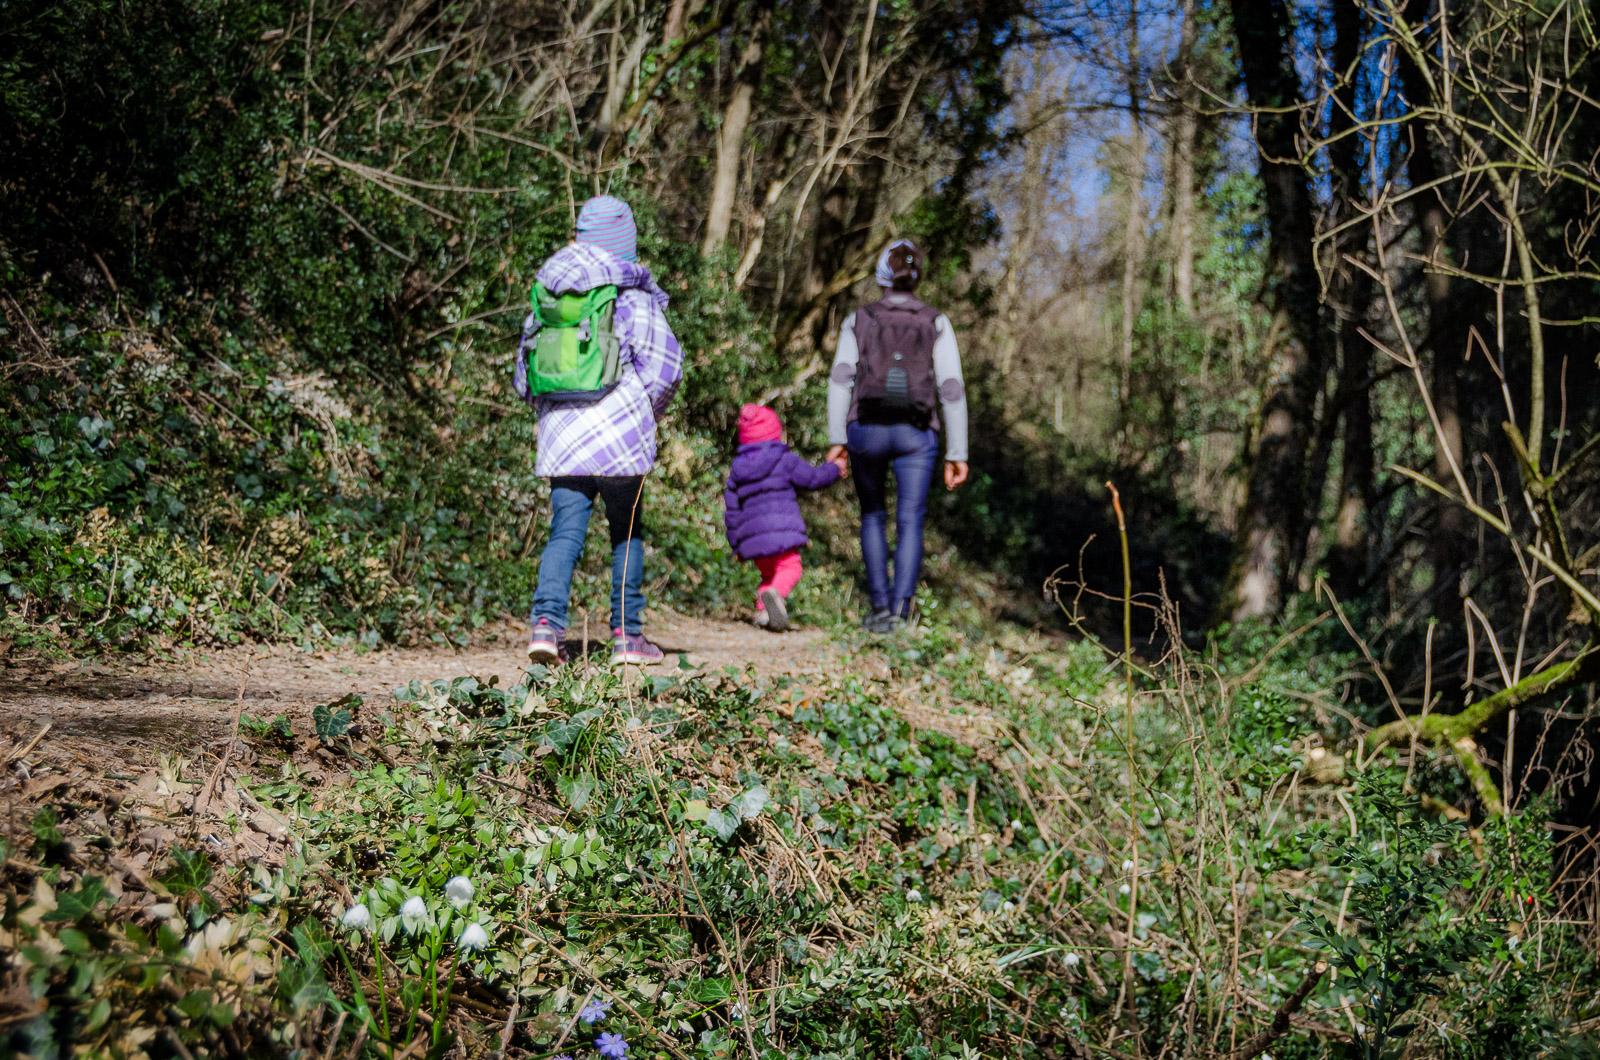 Spaziergang durch das Frühlingstal